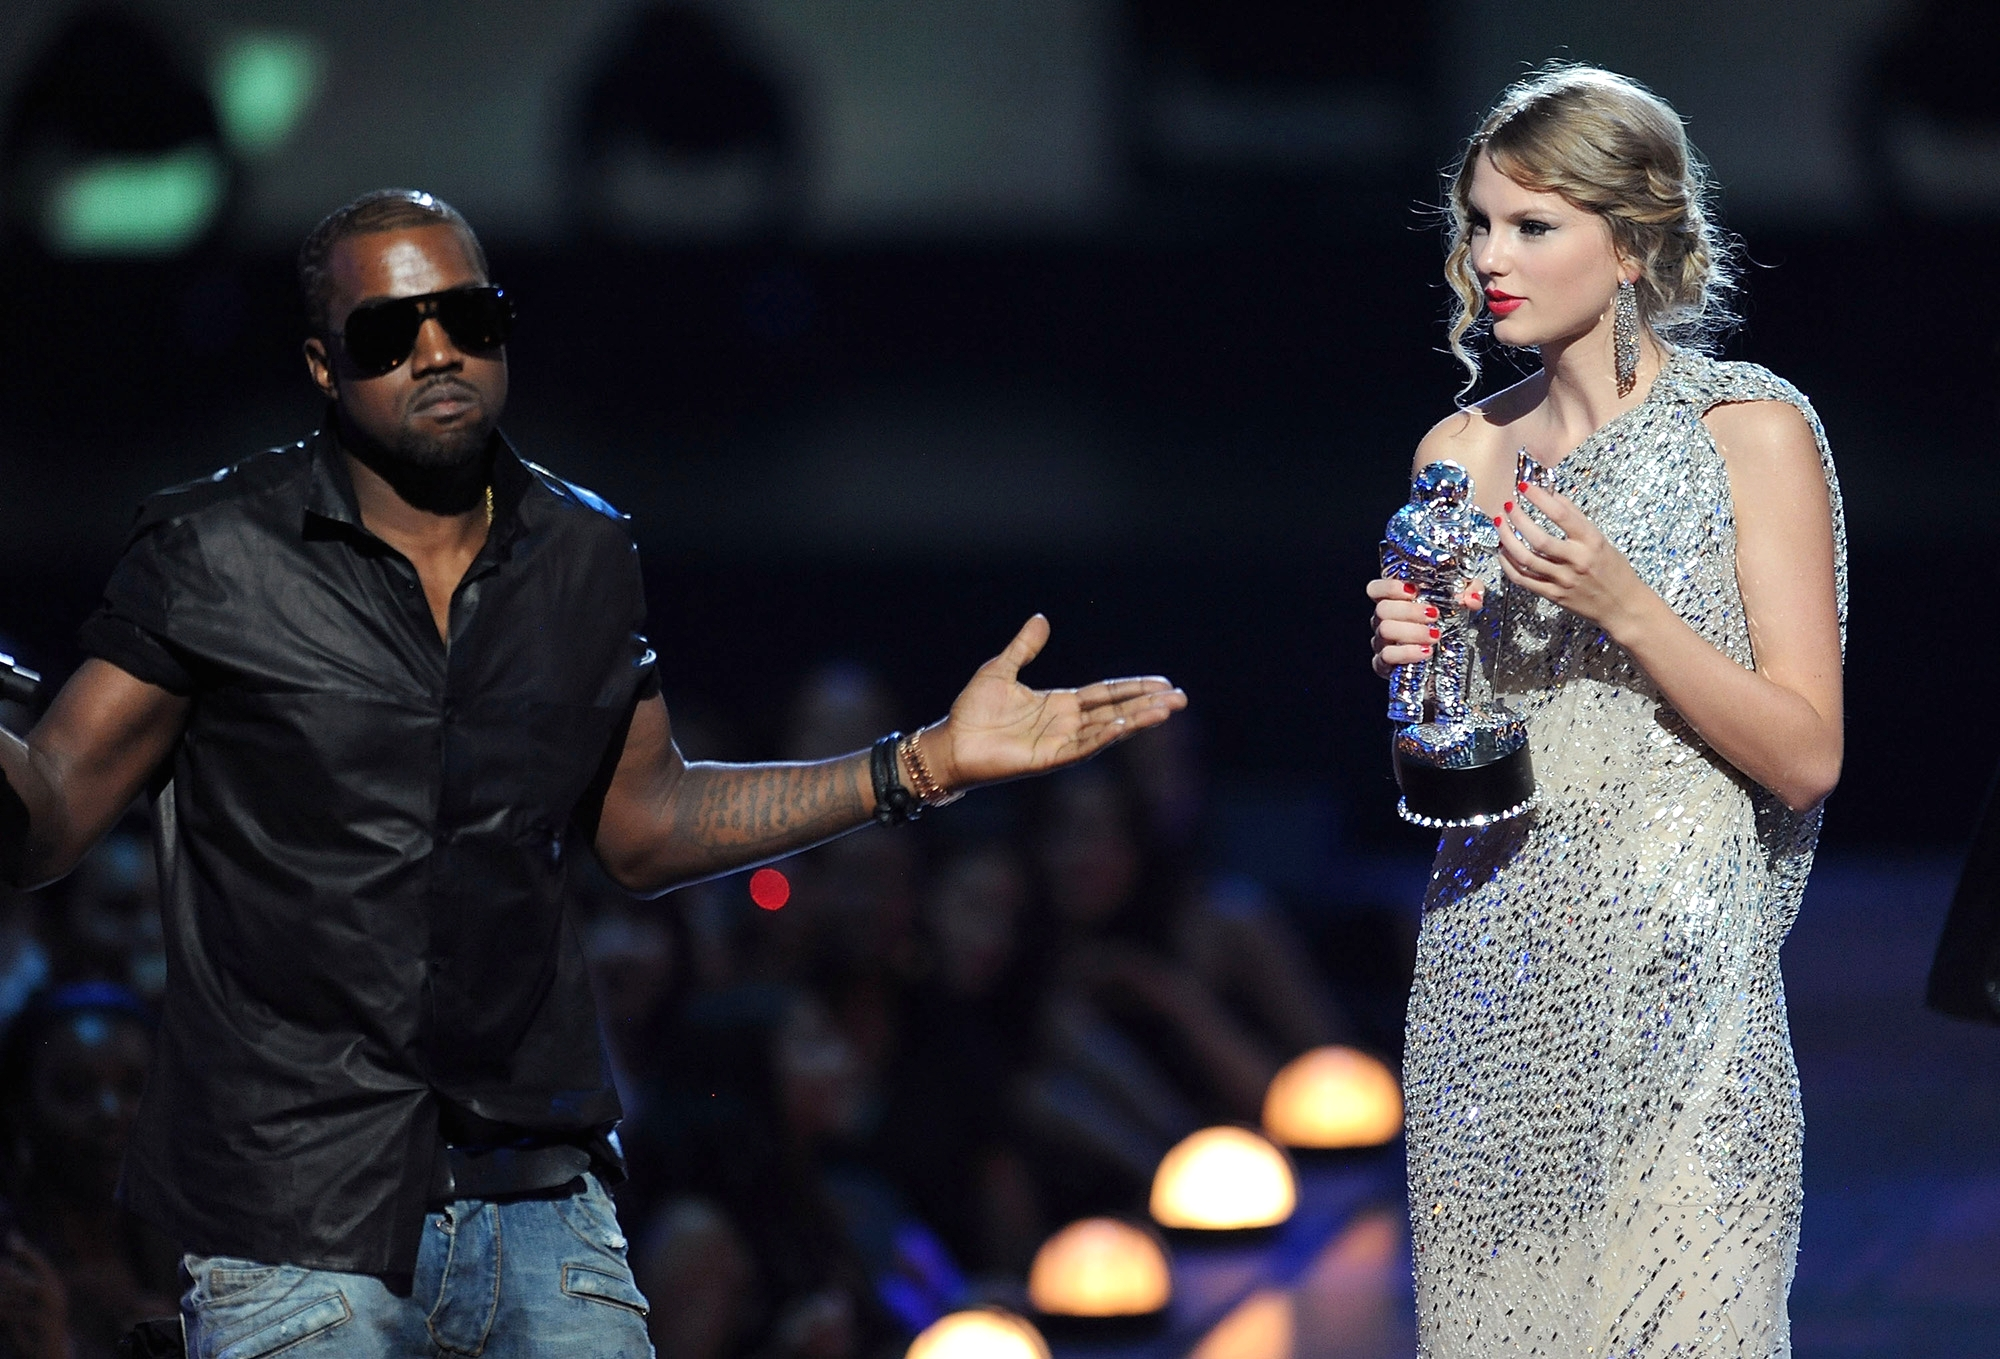 Канье Уэст прерывает Тейлор Свифт на VMA 2009